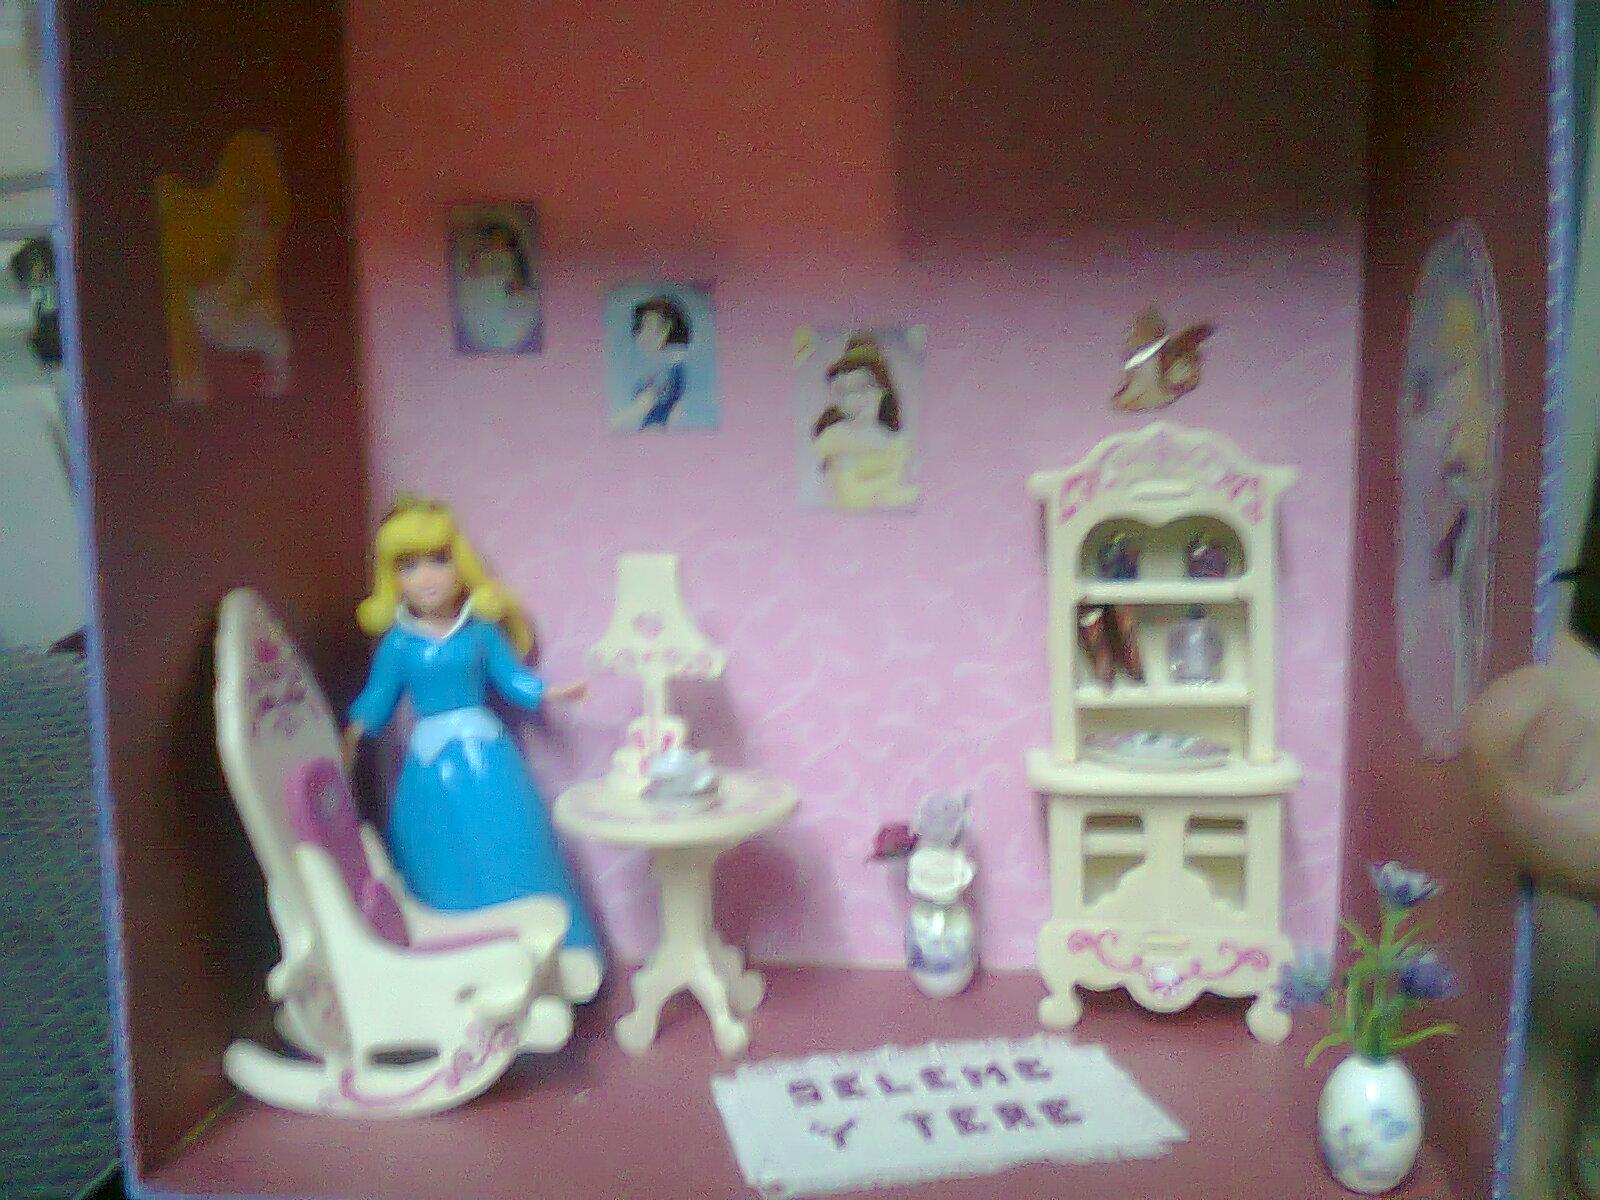 Las miniaturas de esperanza la casita de mis princesas - Casitas de princesas ...